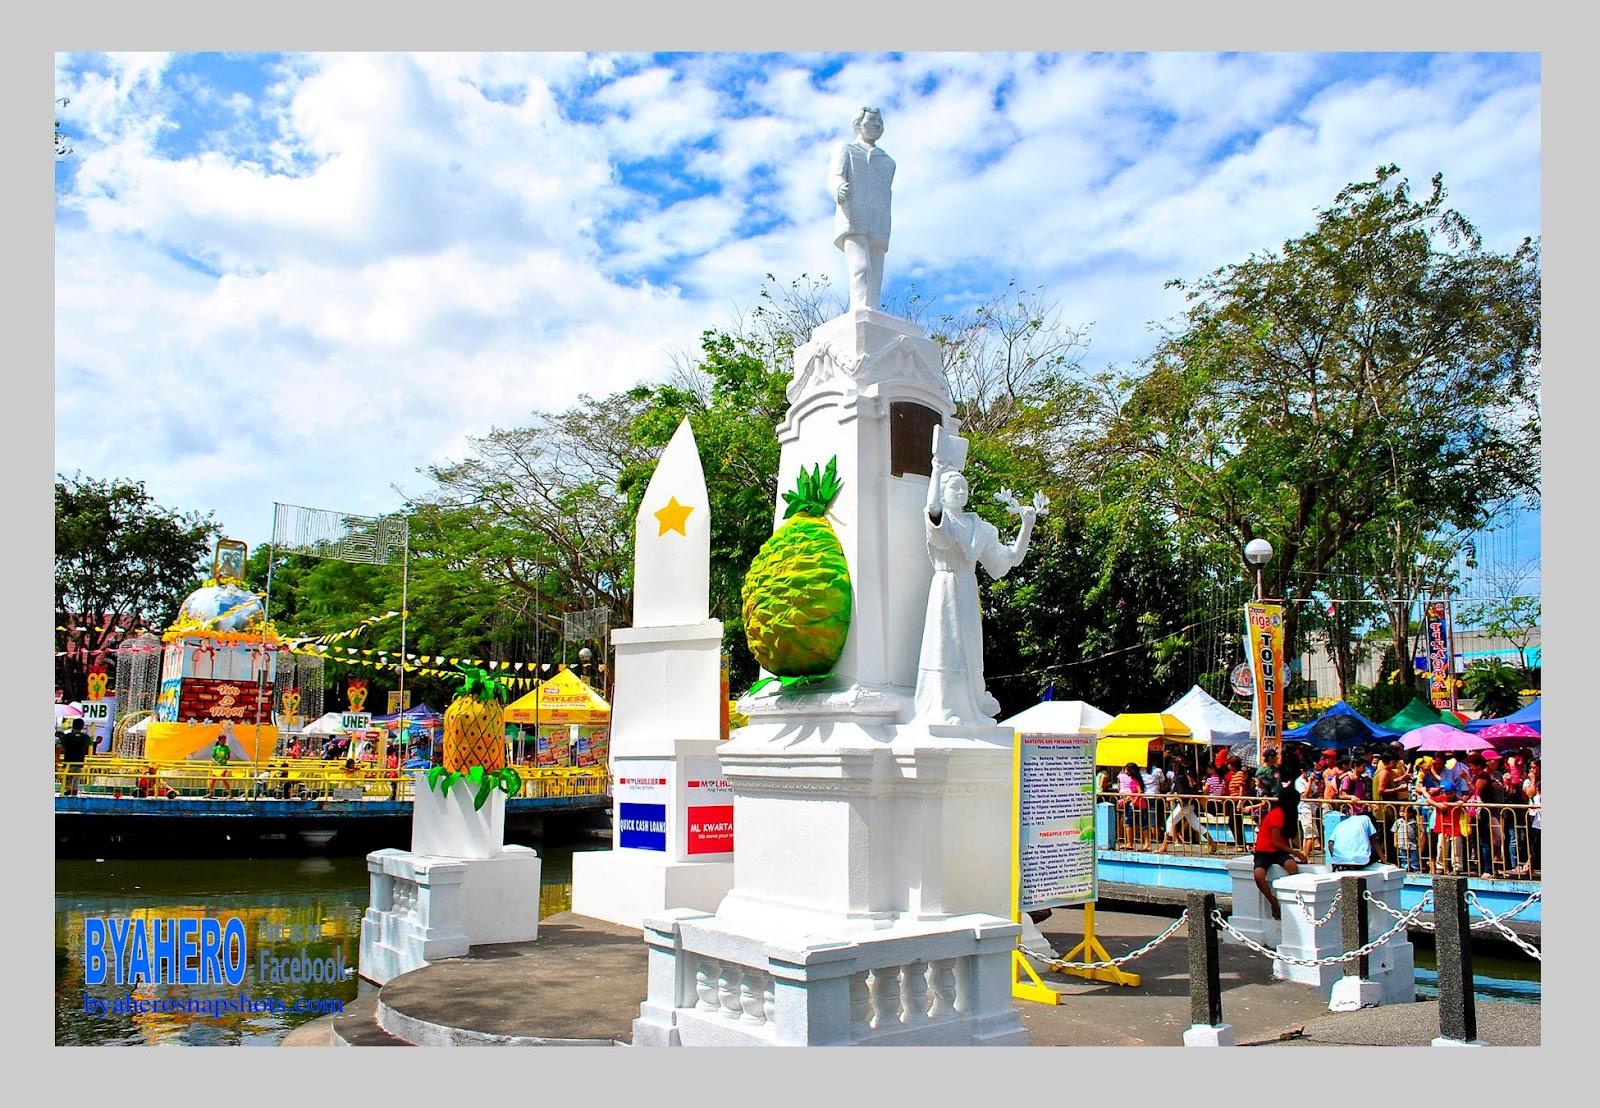 Iriga City Philippines  city photos gallery : Byahero: Jose Rizal Monument in Iriga City, Camarines Sur